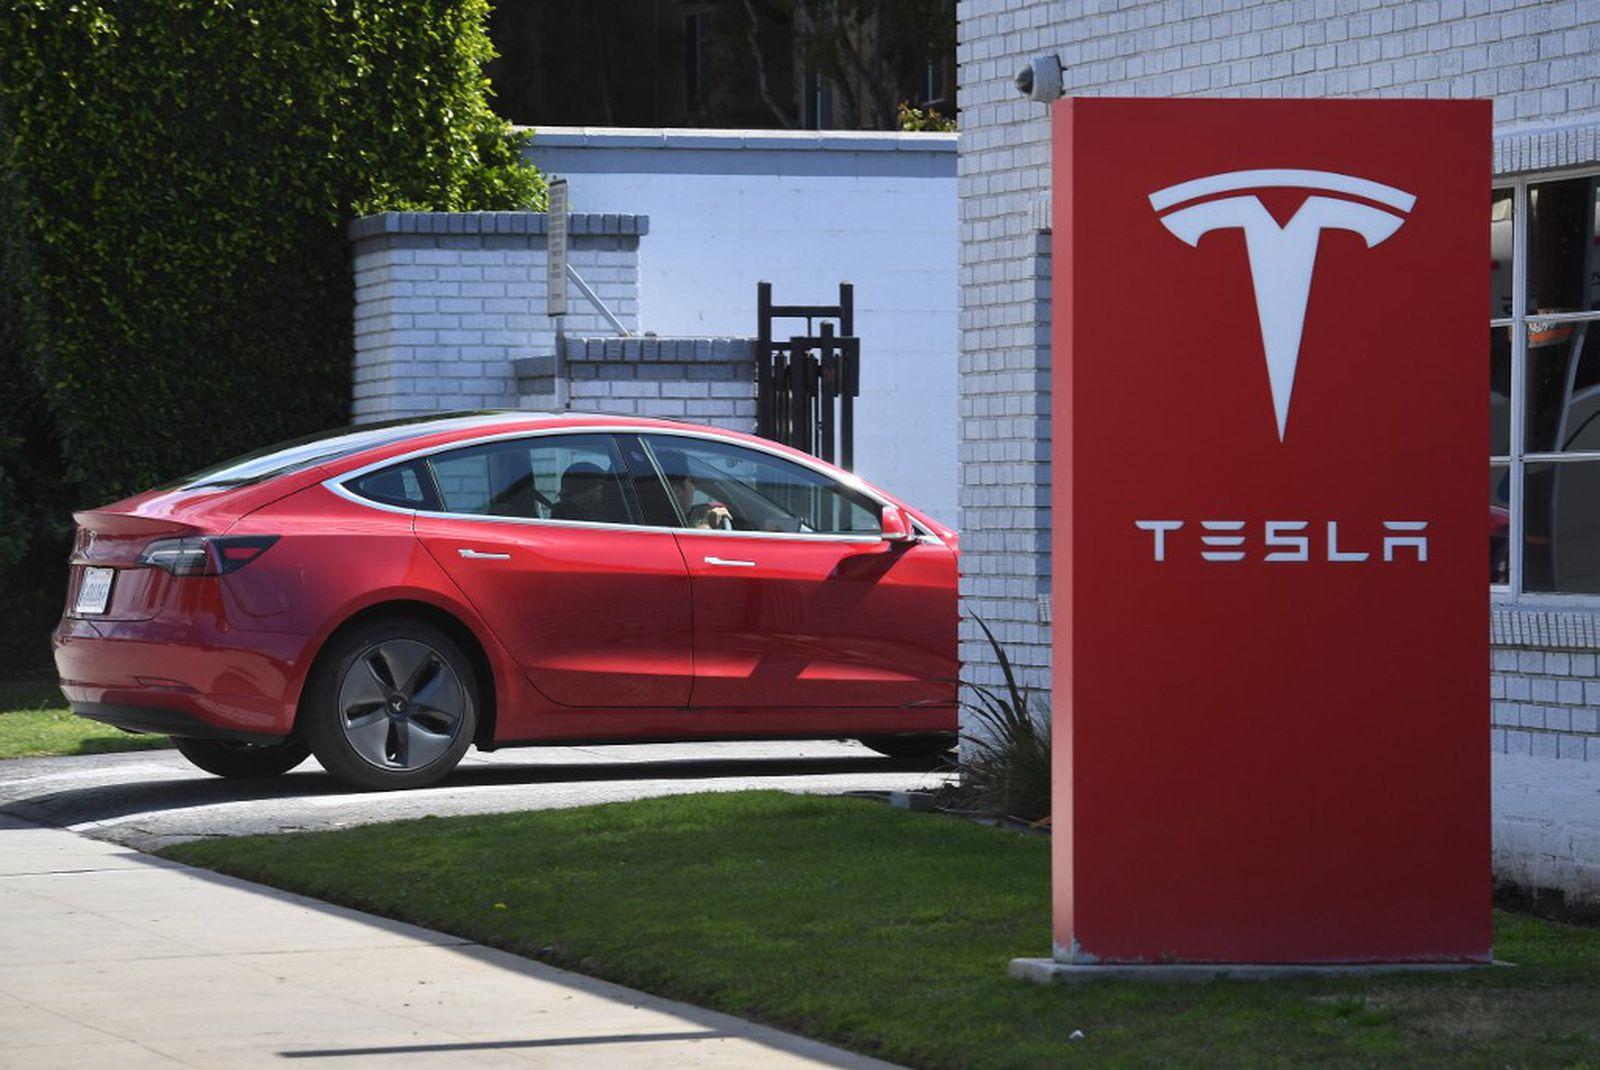 Volkswagen има намера да купи удел во Tesla?!